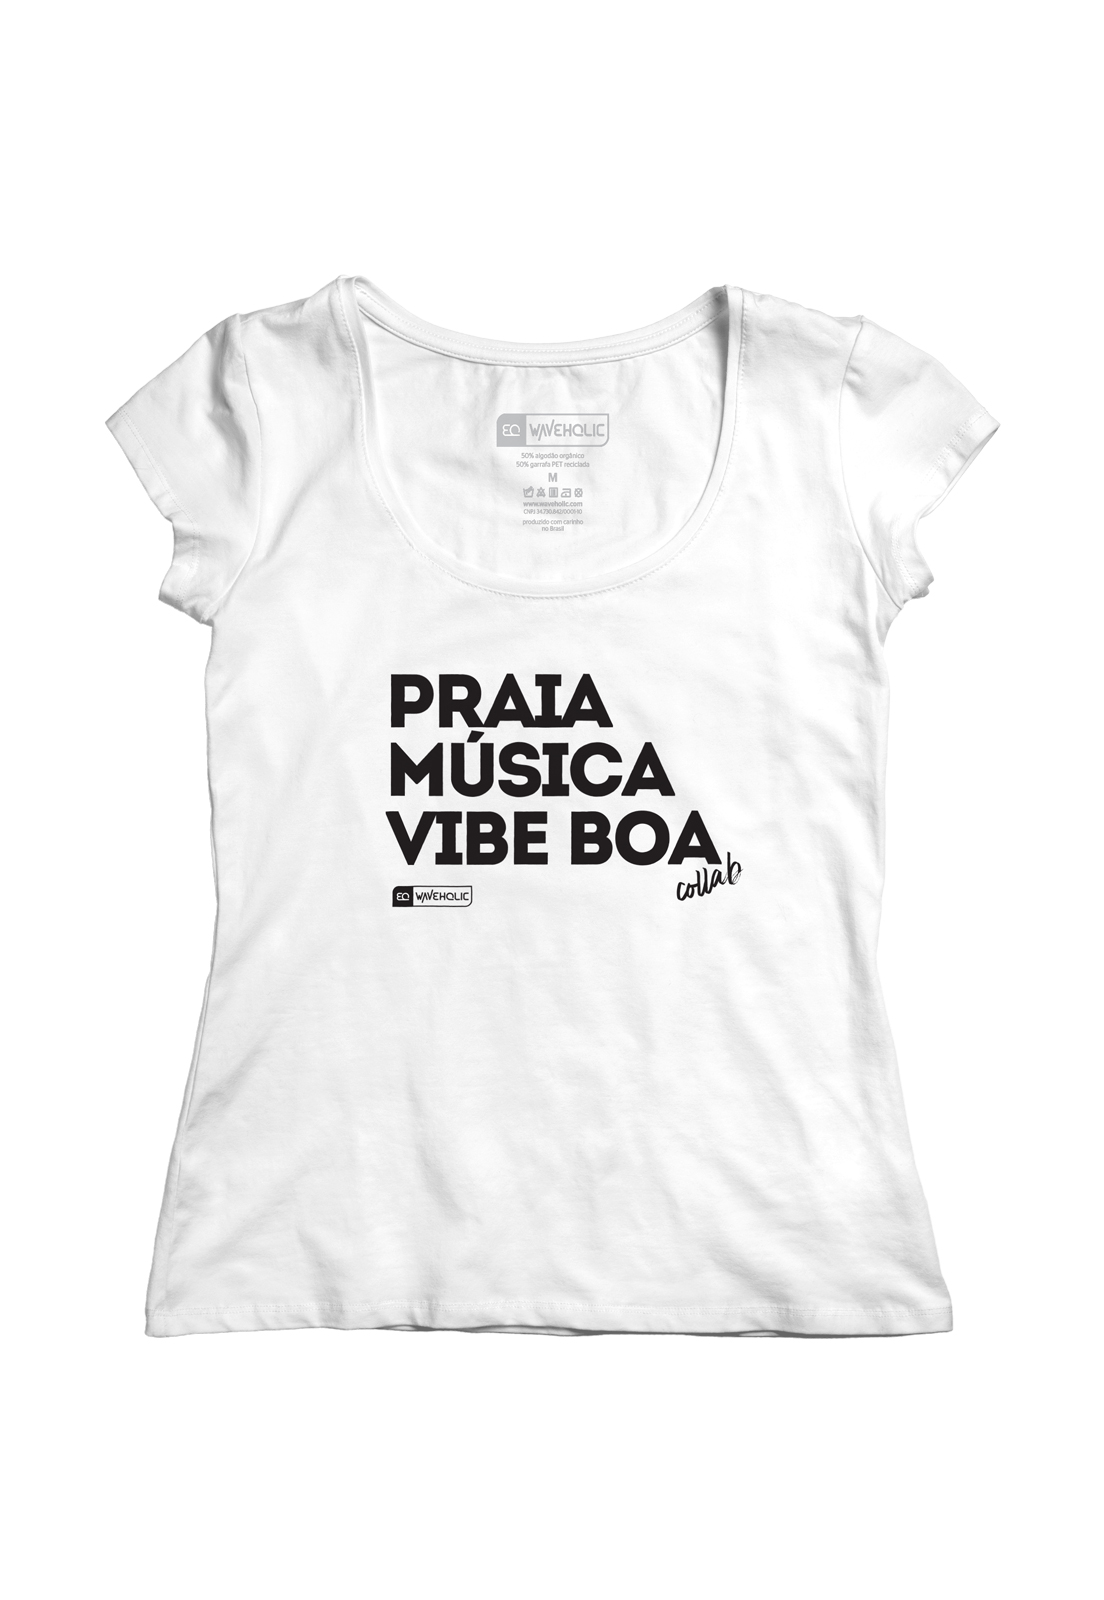 Blusa com frase praia música vibe boa preta ou branca